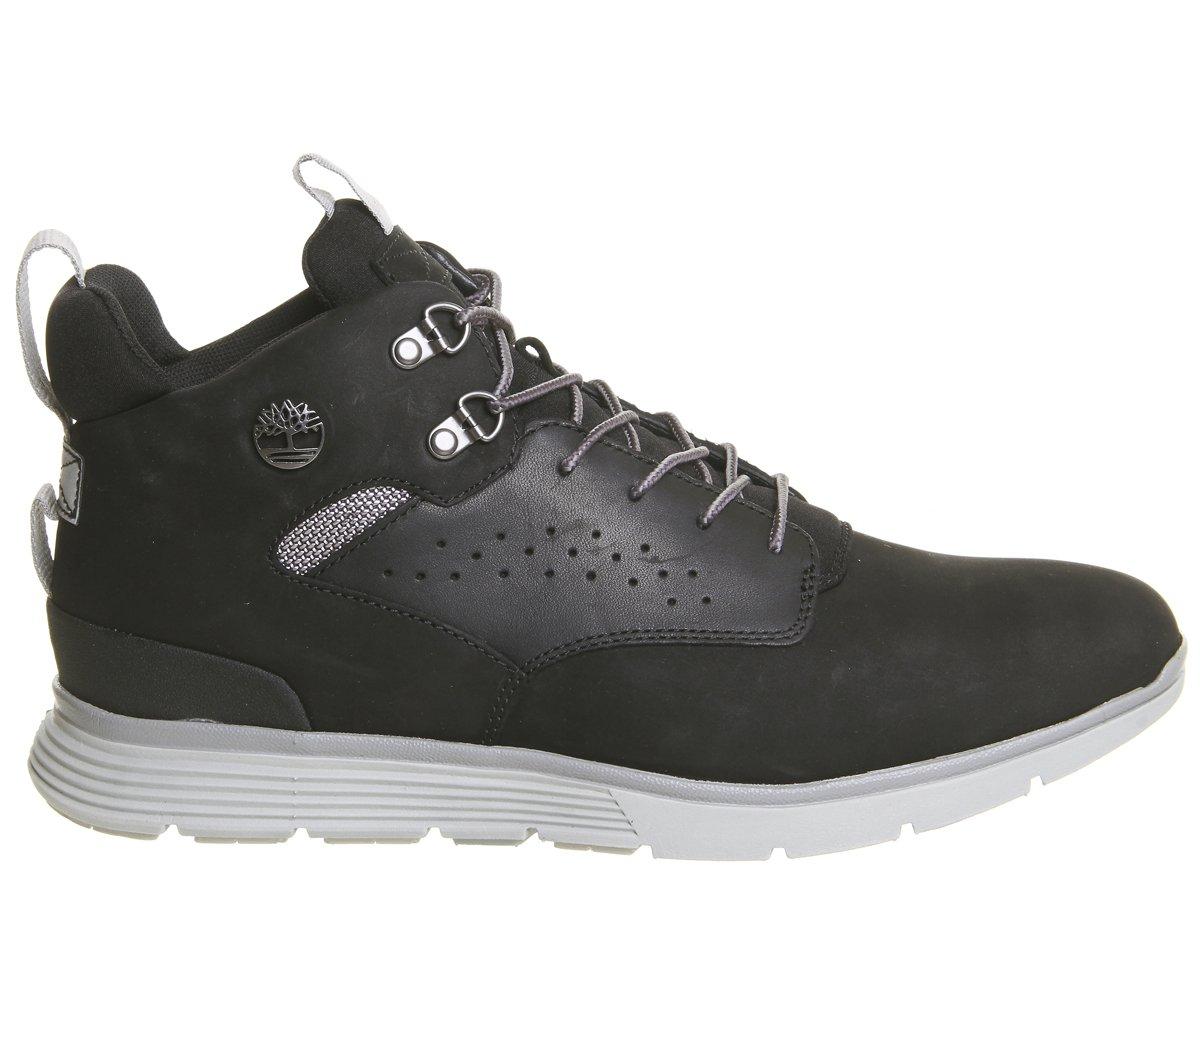 Timberland Killington Hiker Chu BLACK, MAN, Size: 40 EU (7 US / 6.5 UK)